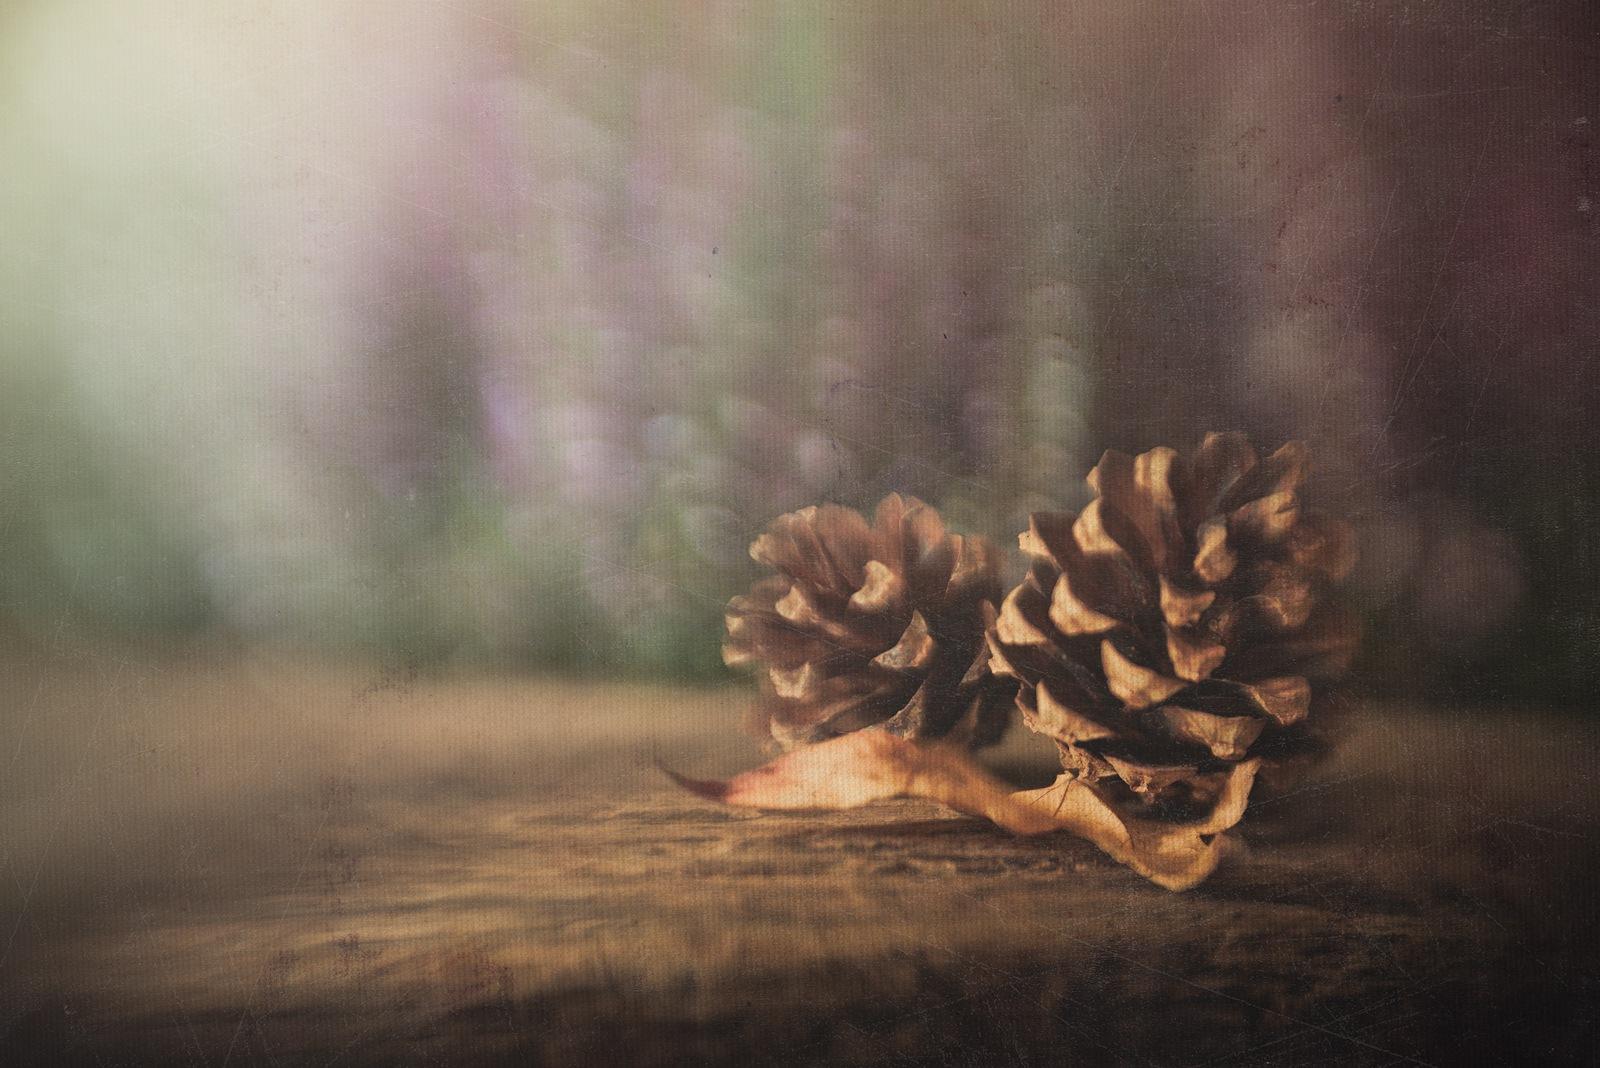 Pinecones by Rosana